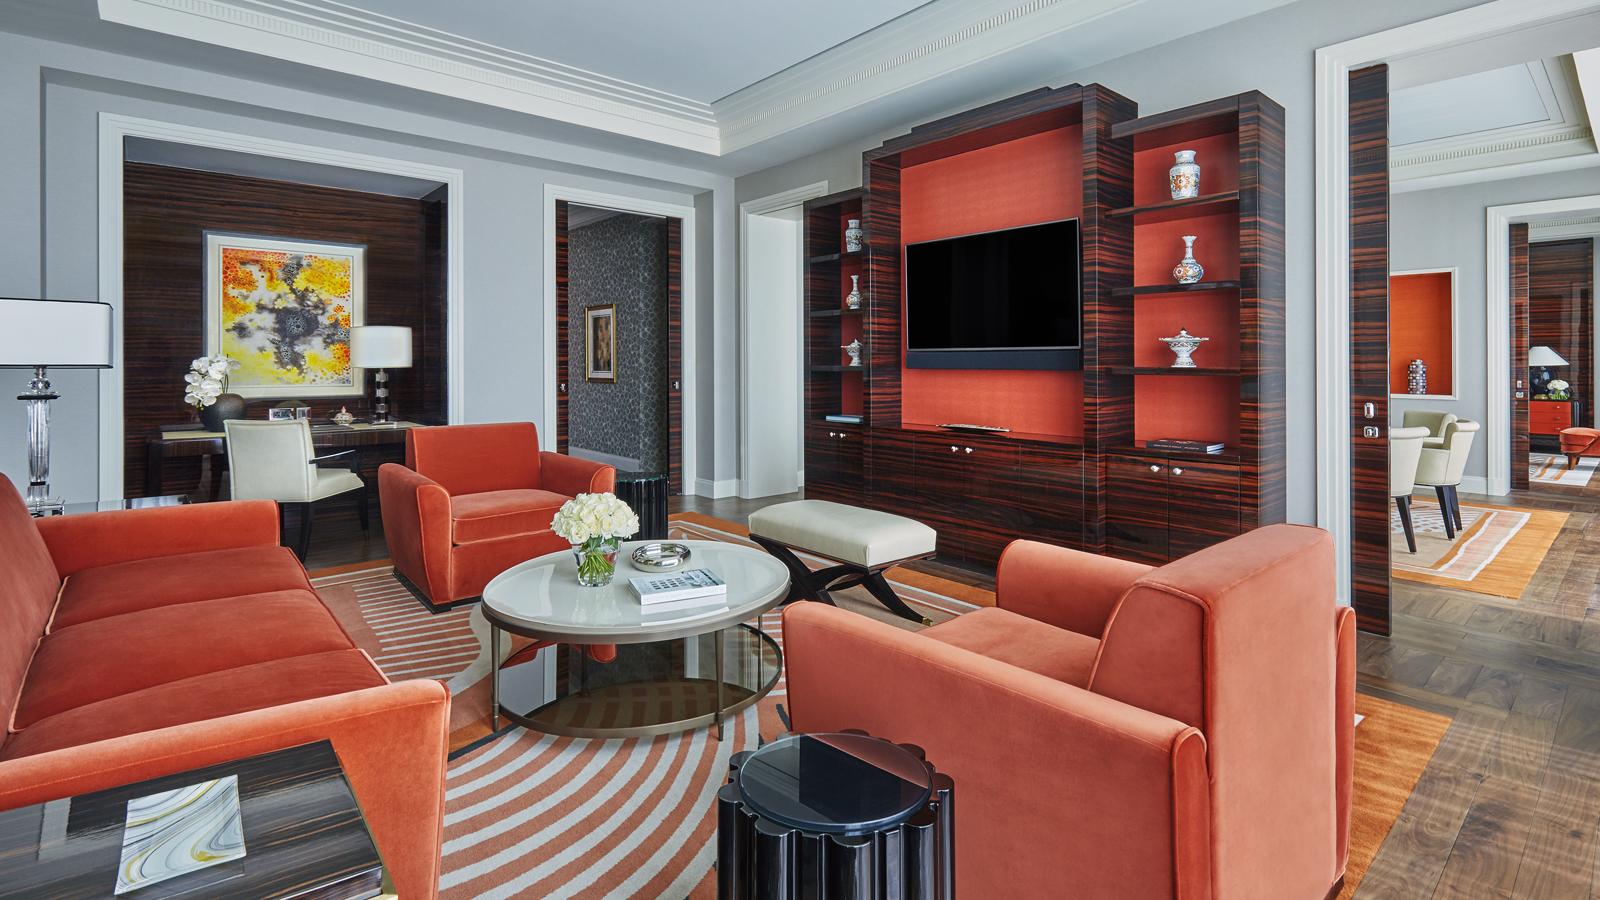 Third Night Free Bahrain Luxury Hotel Room At Four Seasons